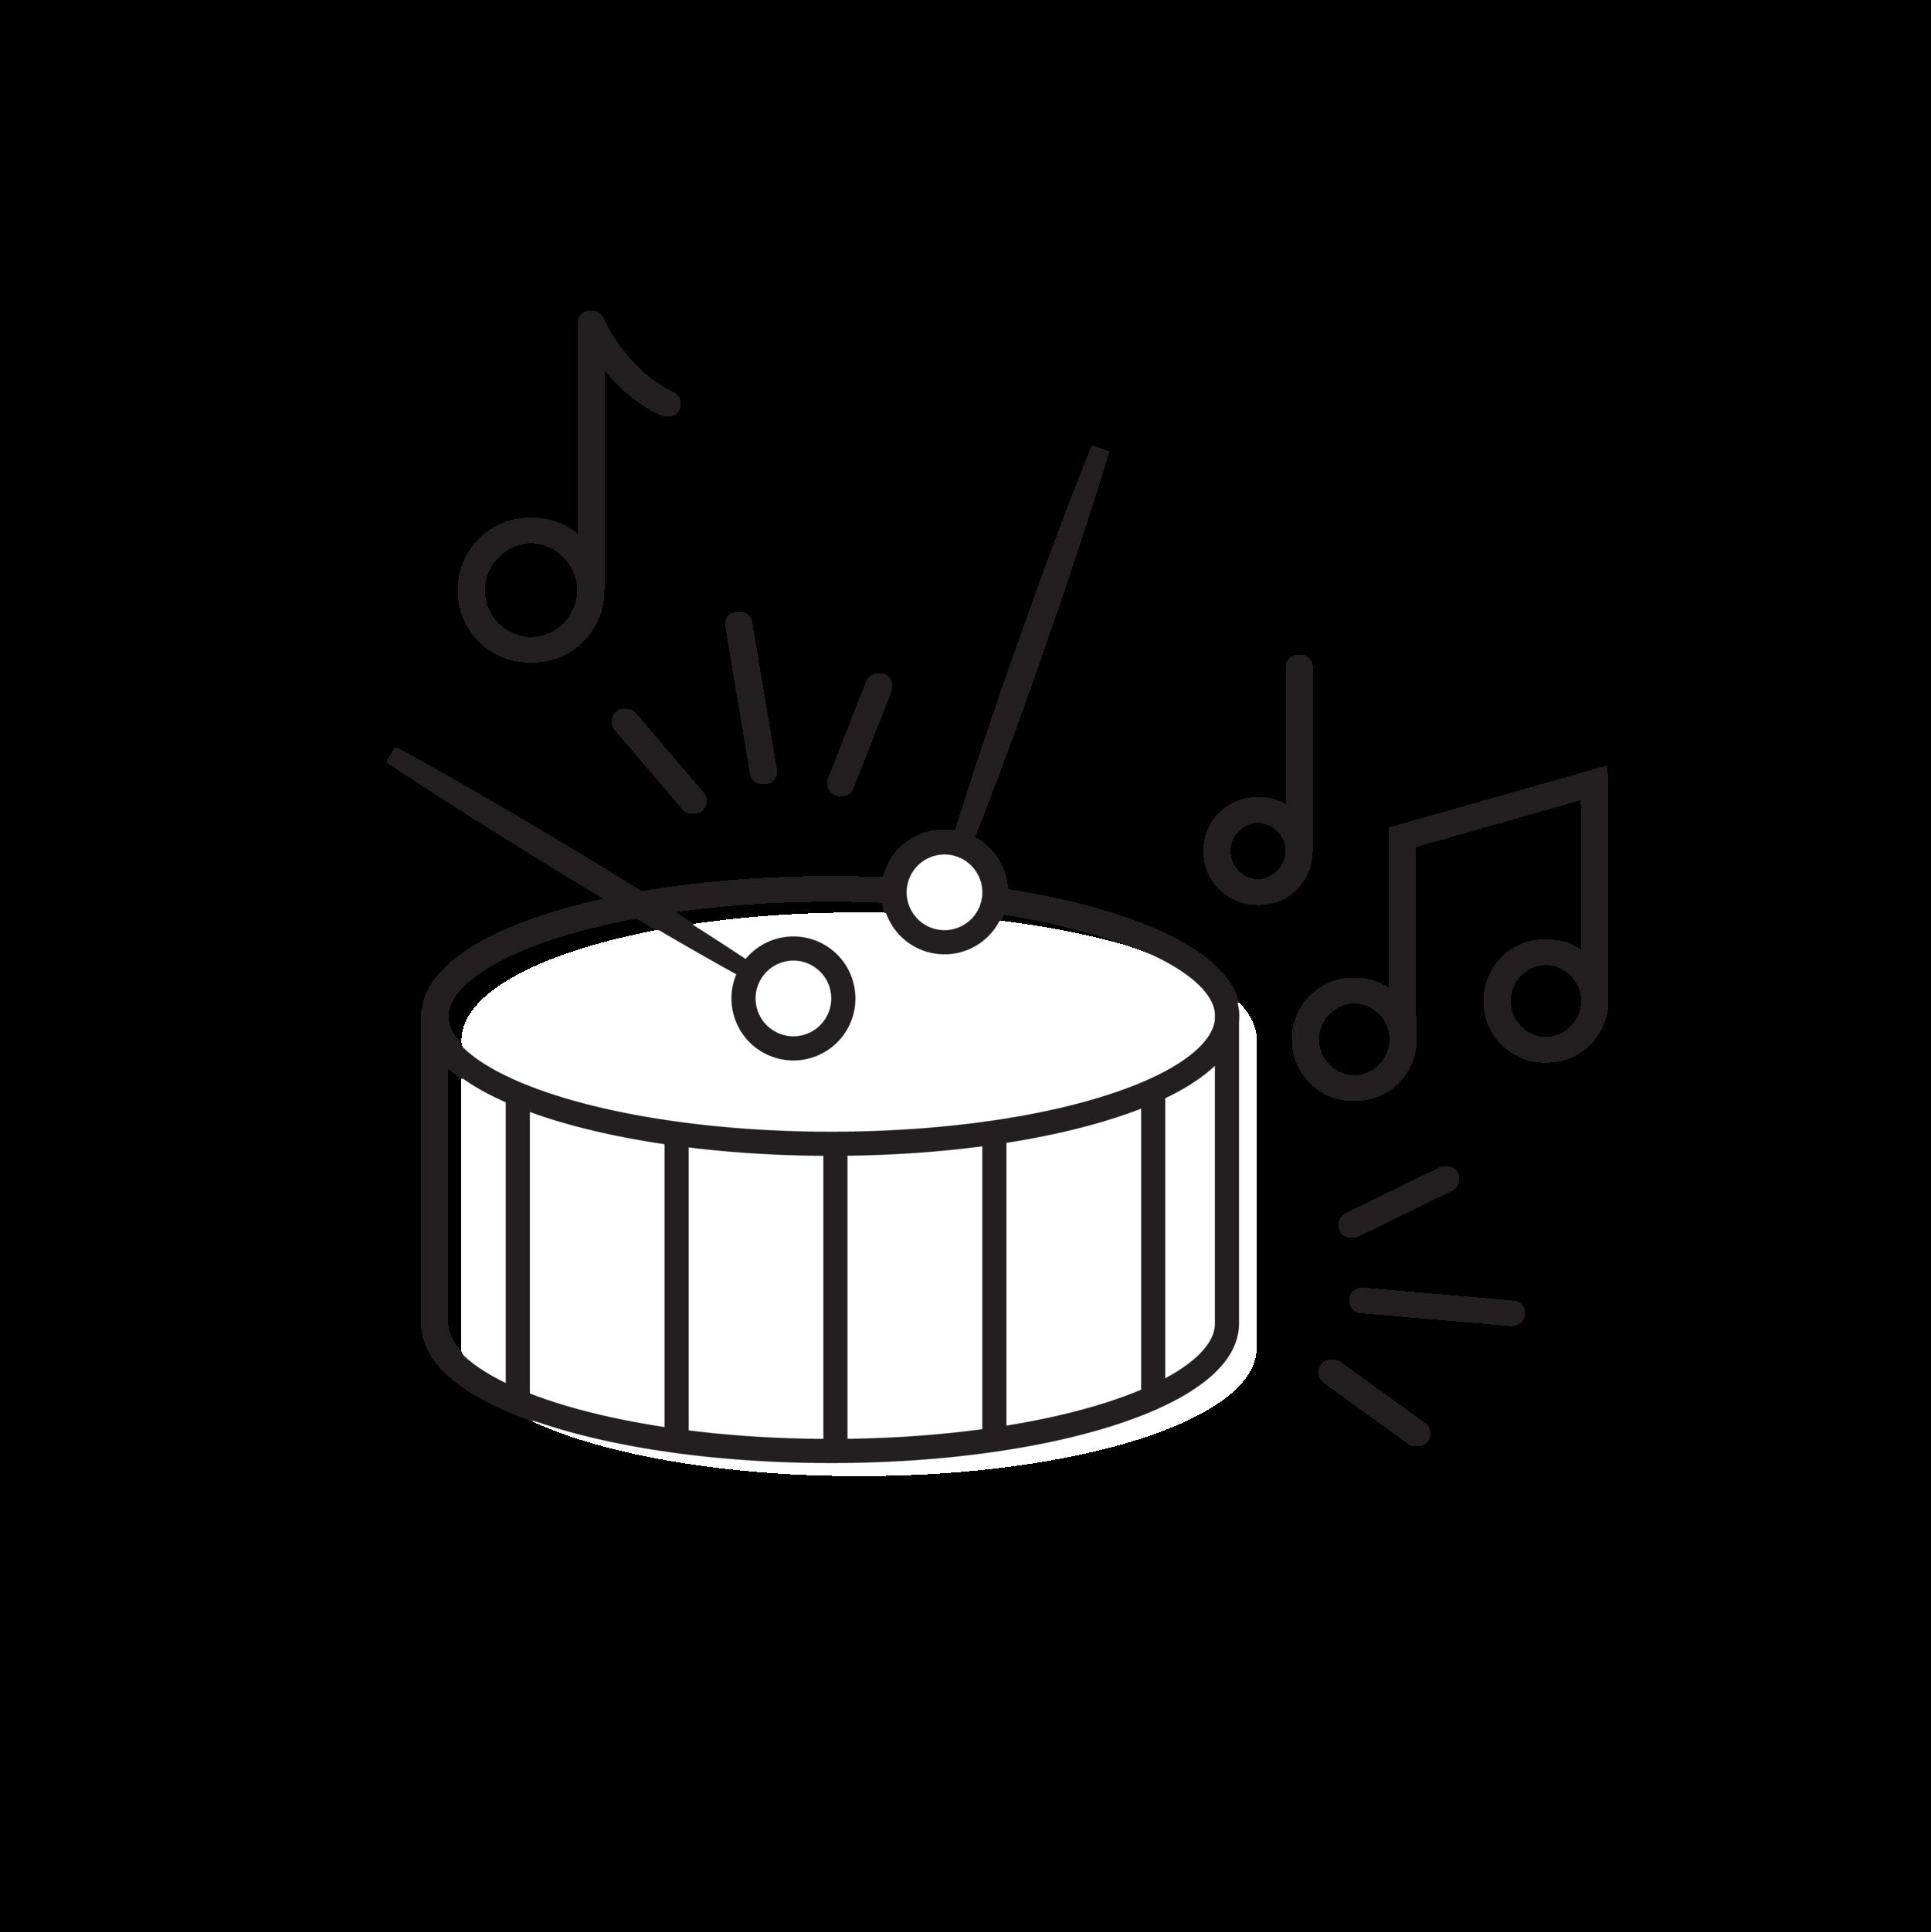 cae-arts-music-drum.png